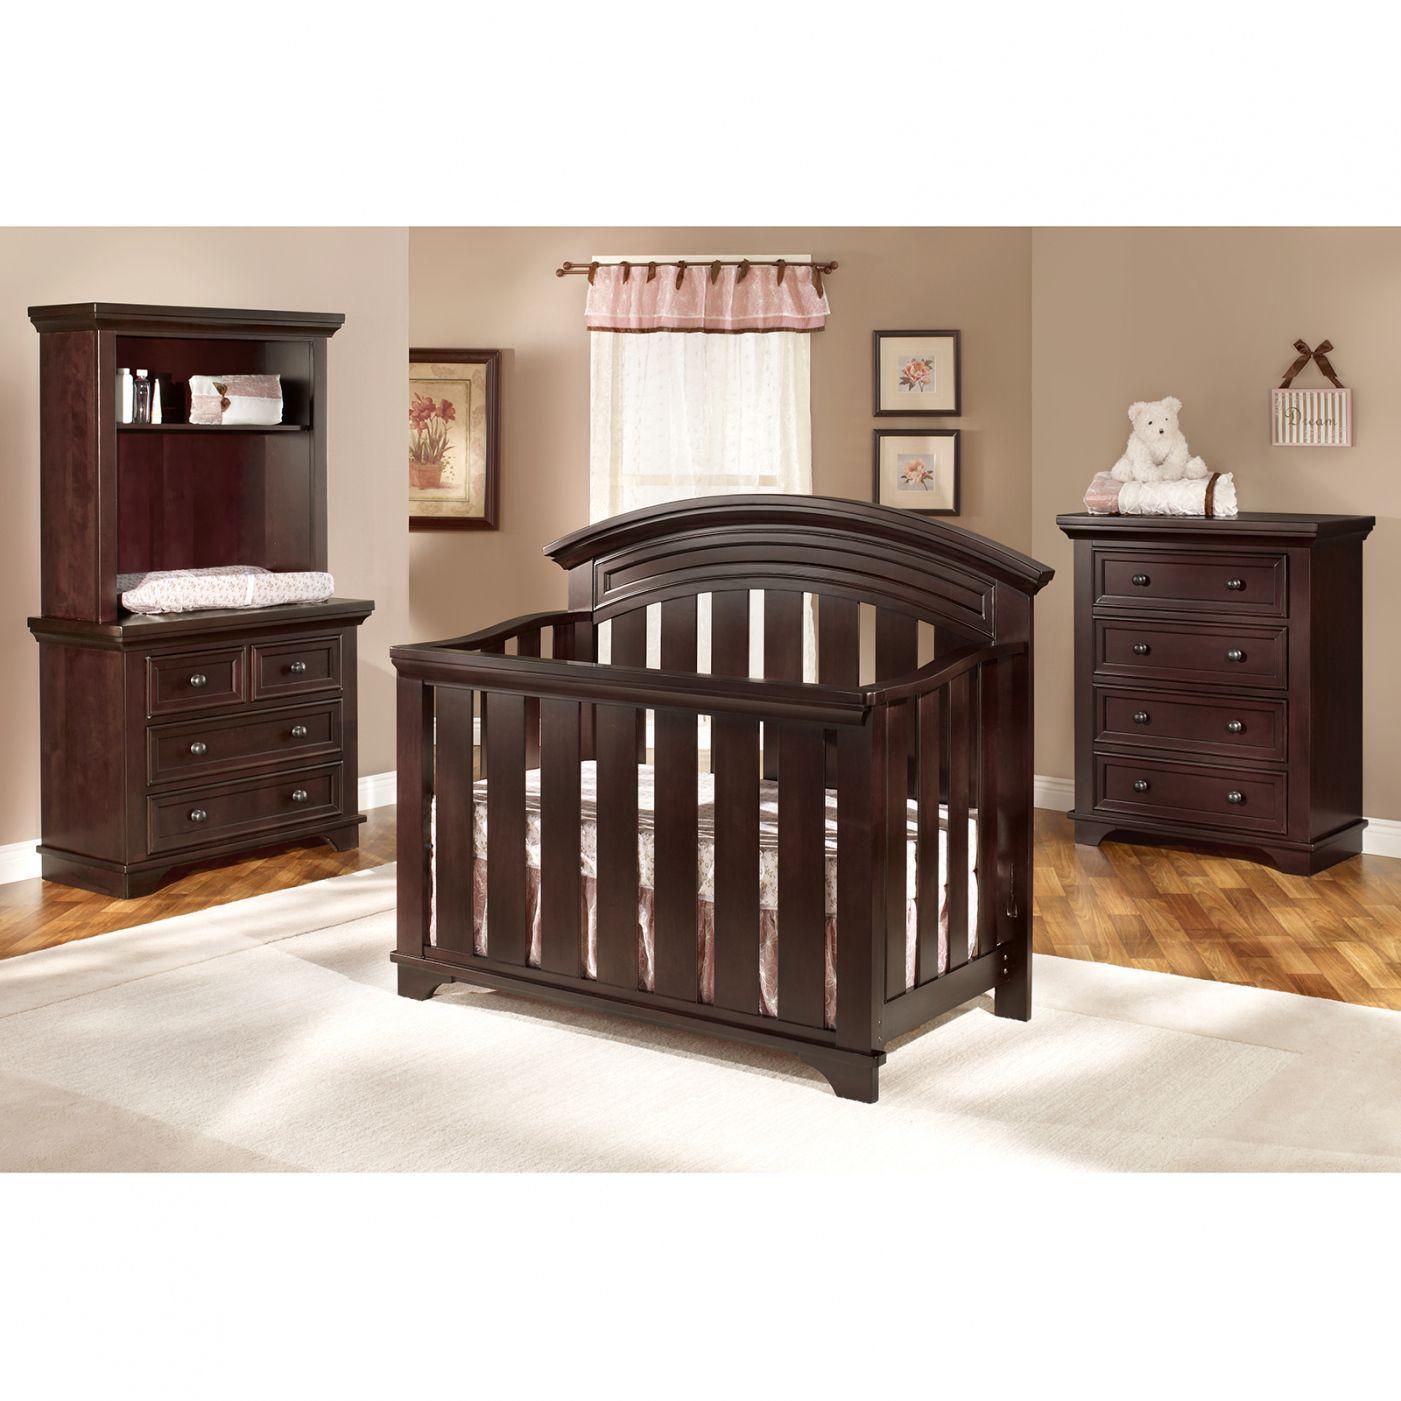 30 Baby Furniture At Burlington Coat Factory Interior Design Master Bedroom Check More A Nursery Furniture Sets Baby Nursery Furniture Sets Nursery Furniture